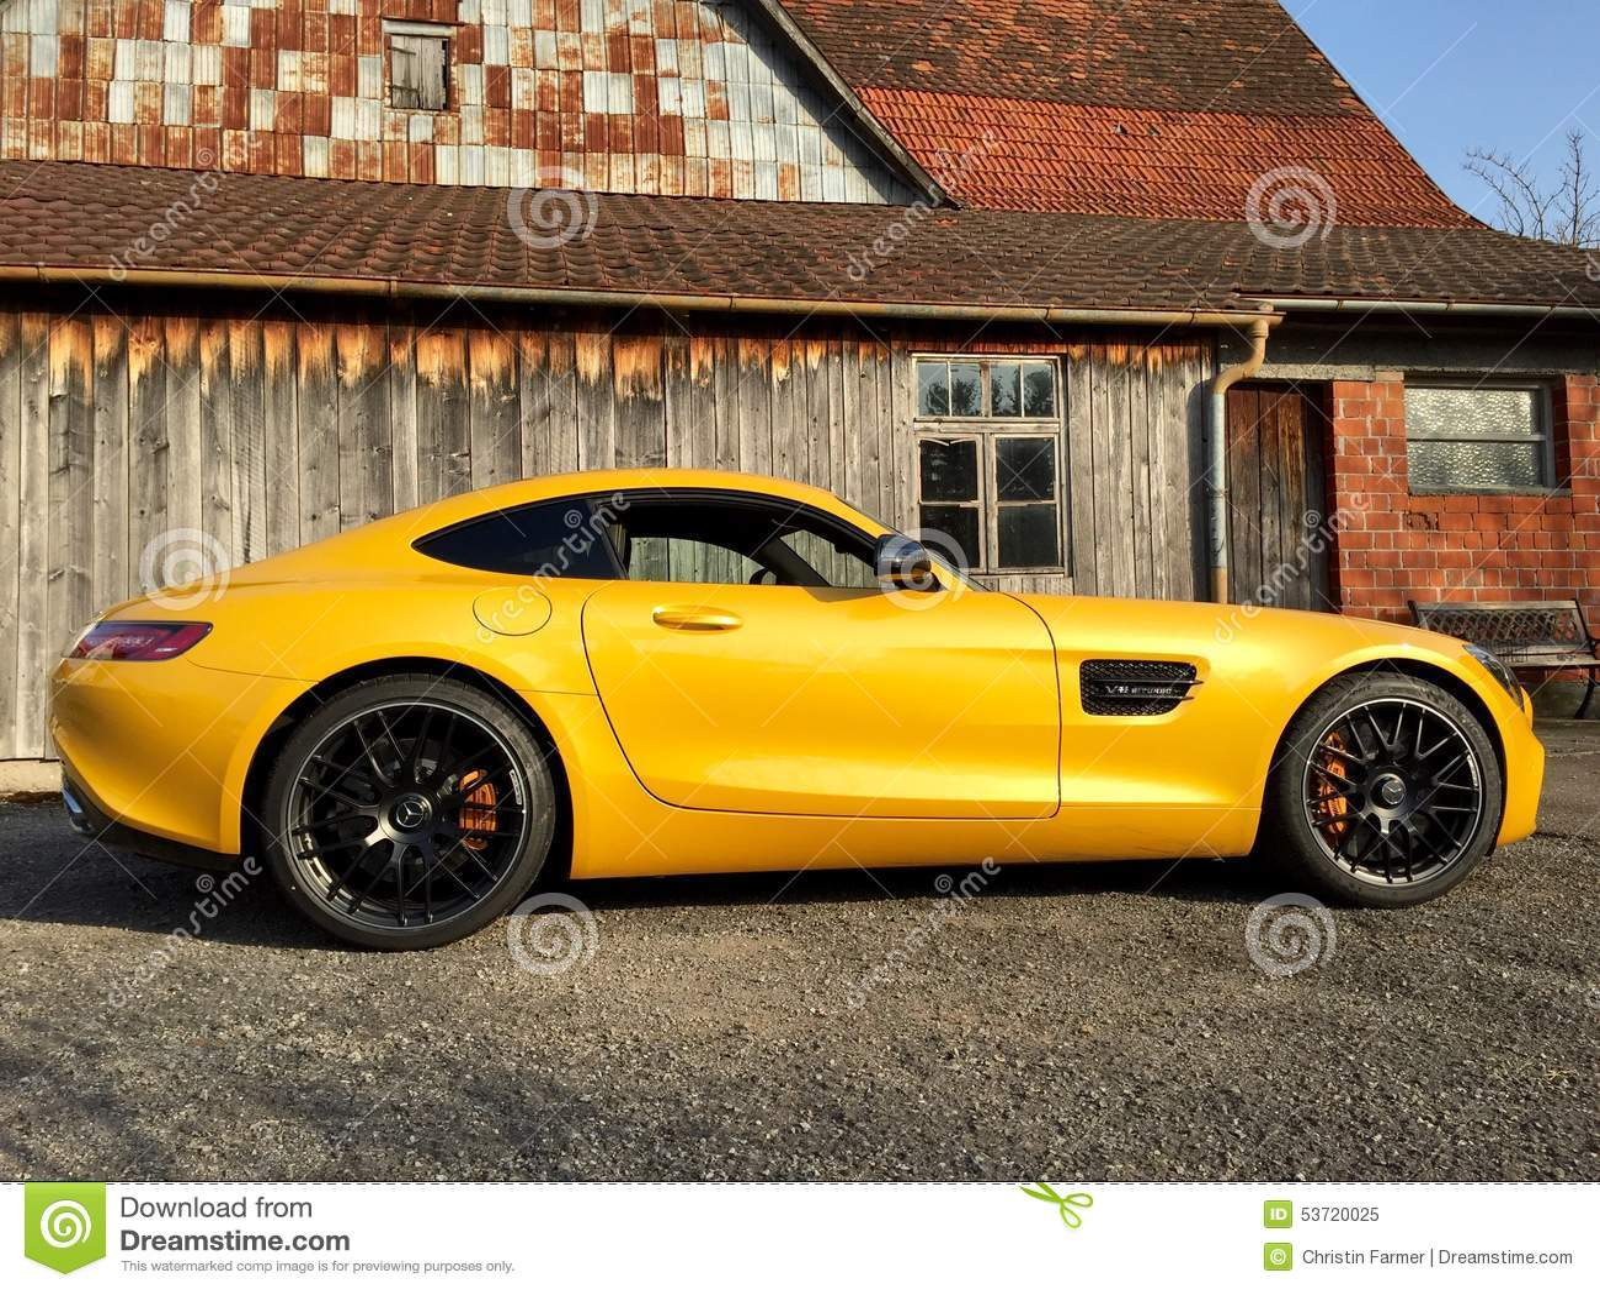 Used Cars For Sale Stuttgart Germany